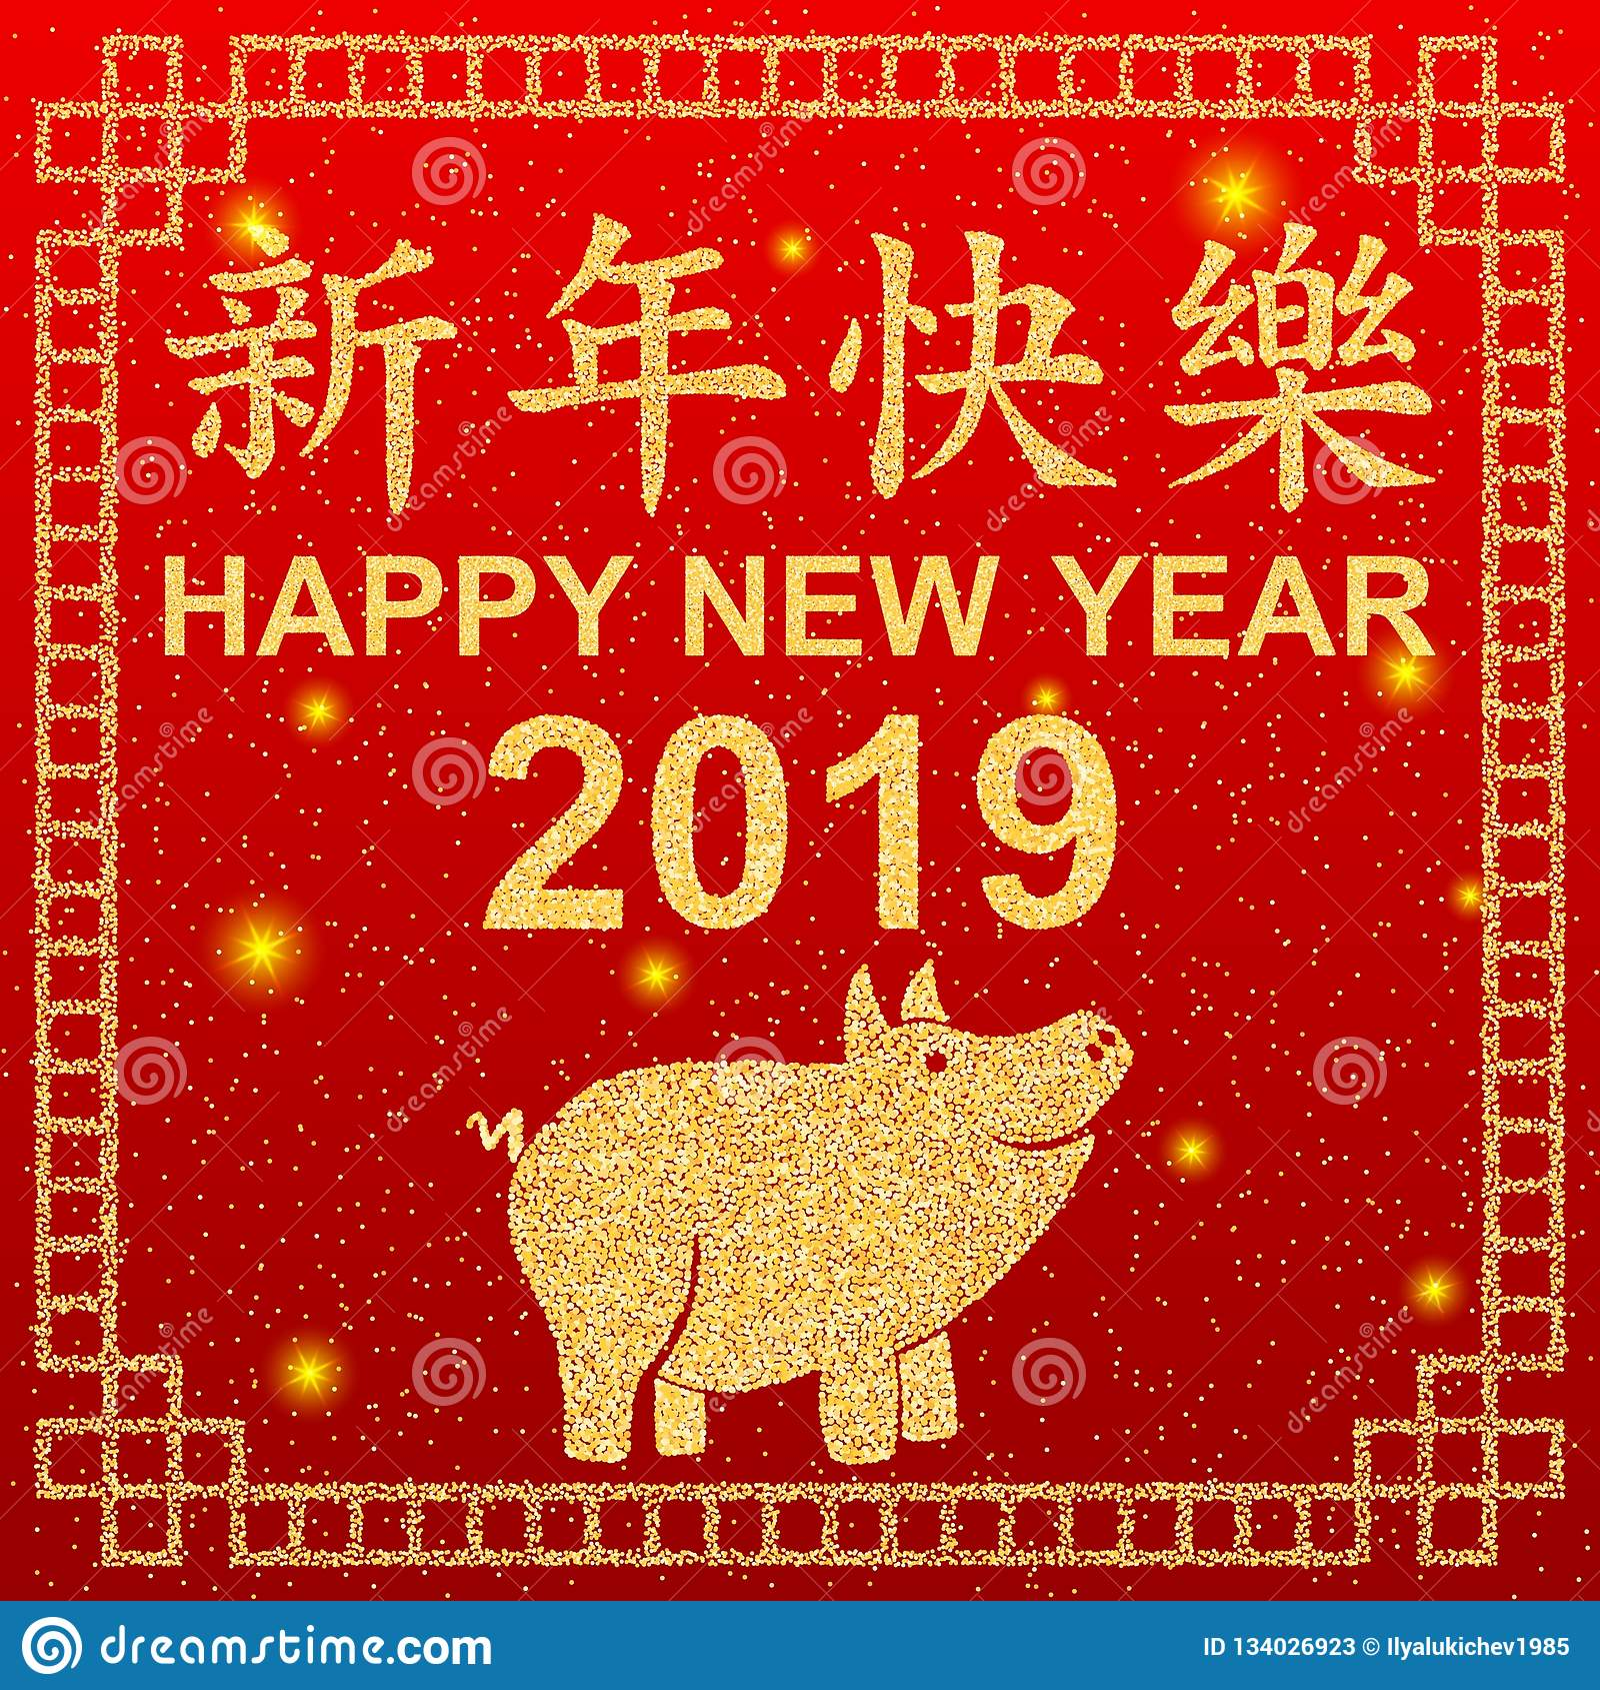 картинки диалог китайскому календарю также привело